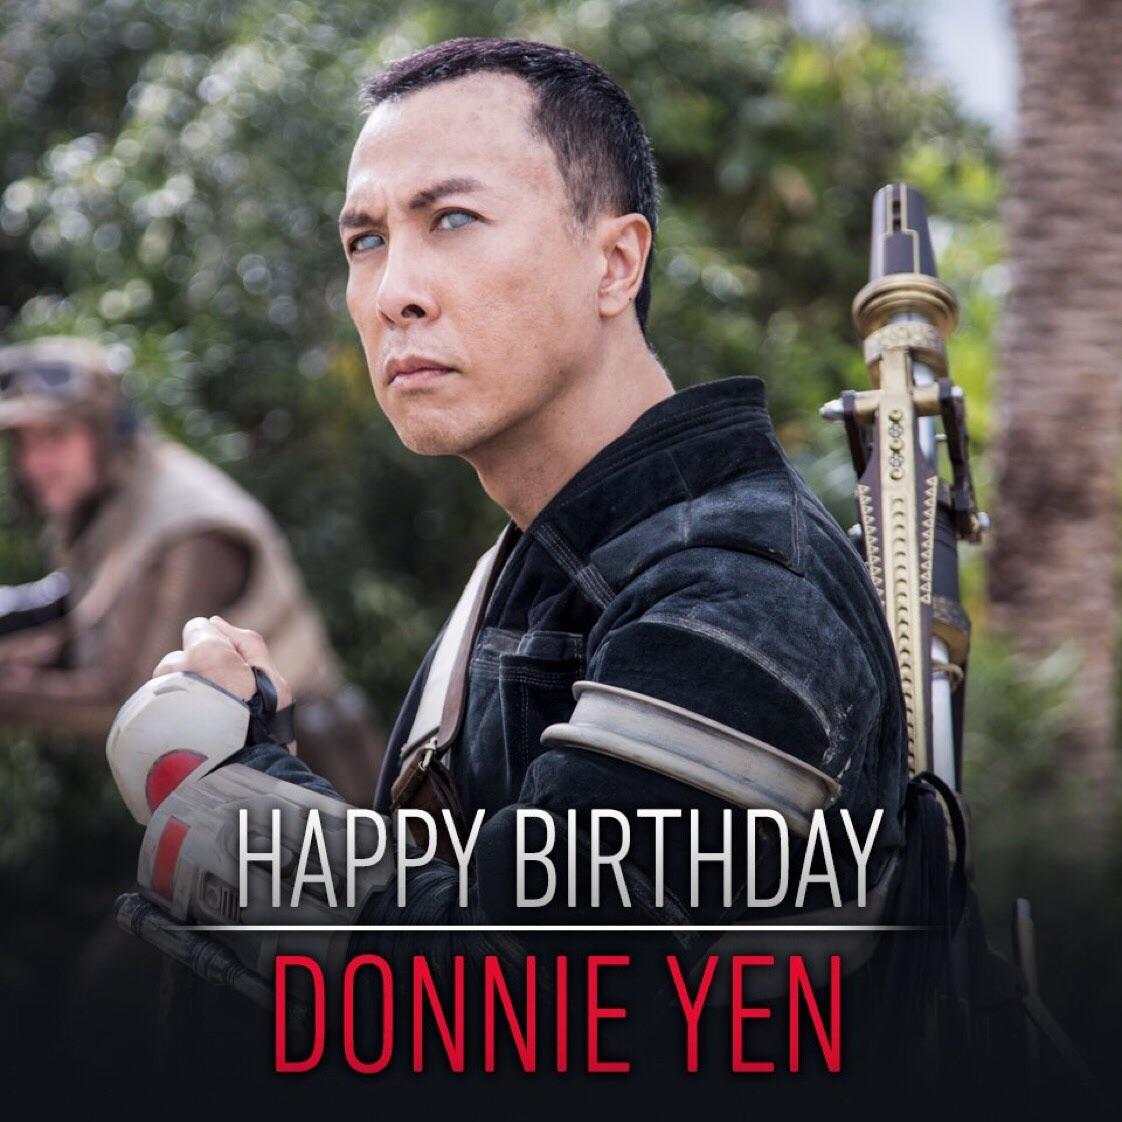 Happy Birthday to Donnie Yen AKA Chirrut Îmwe